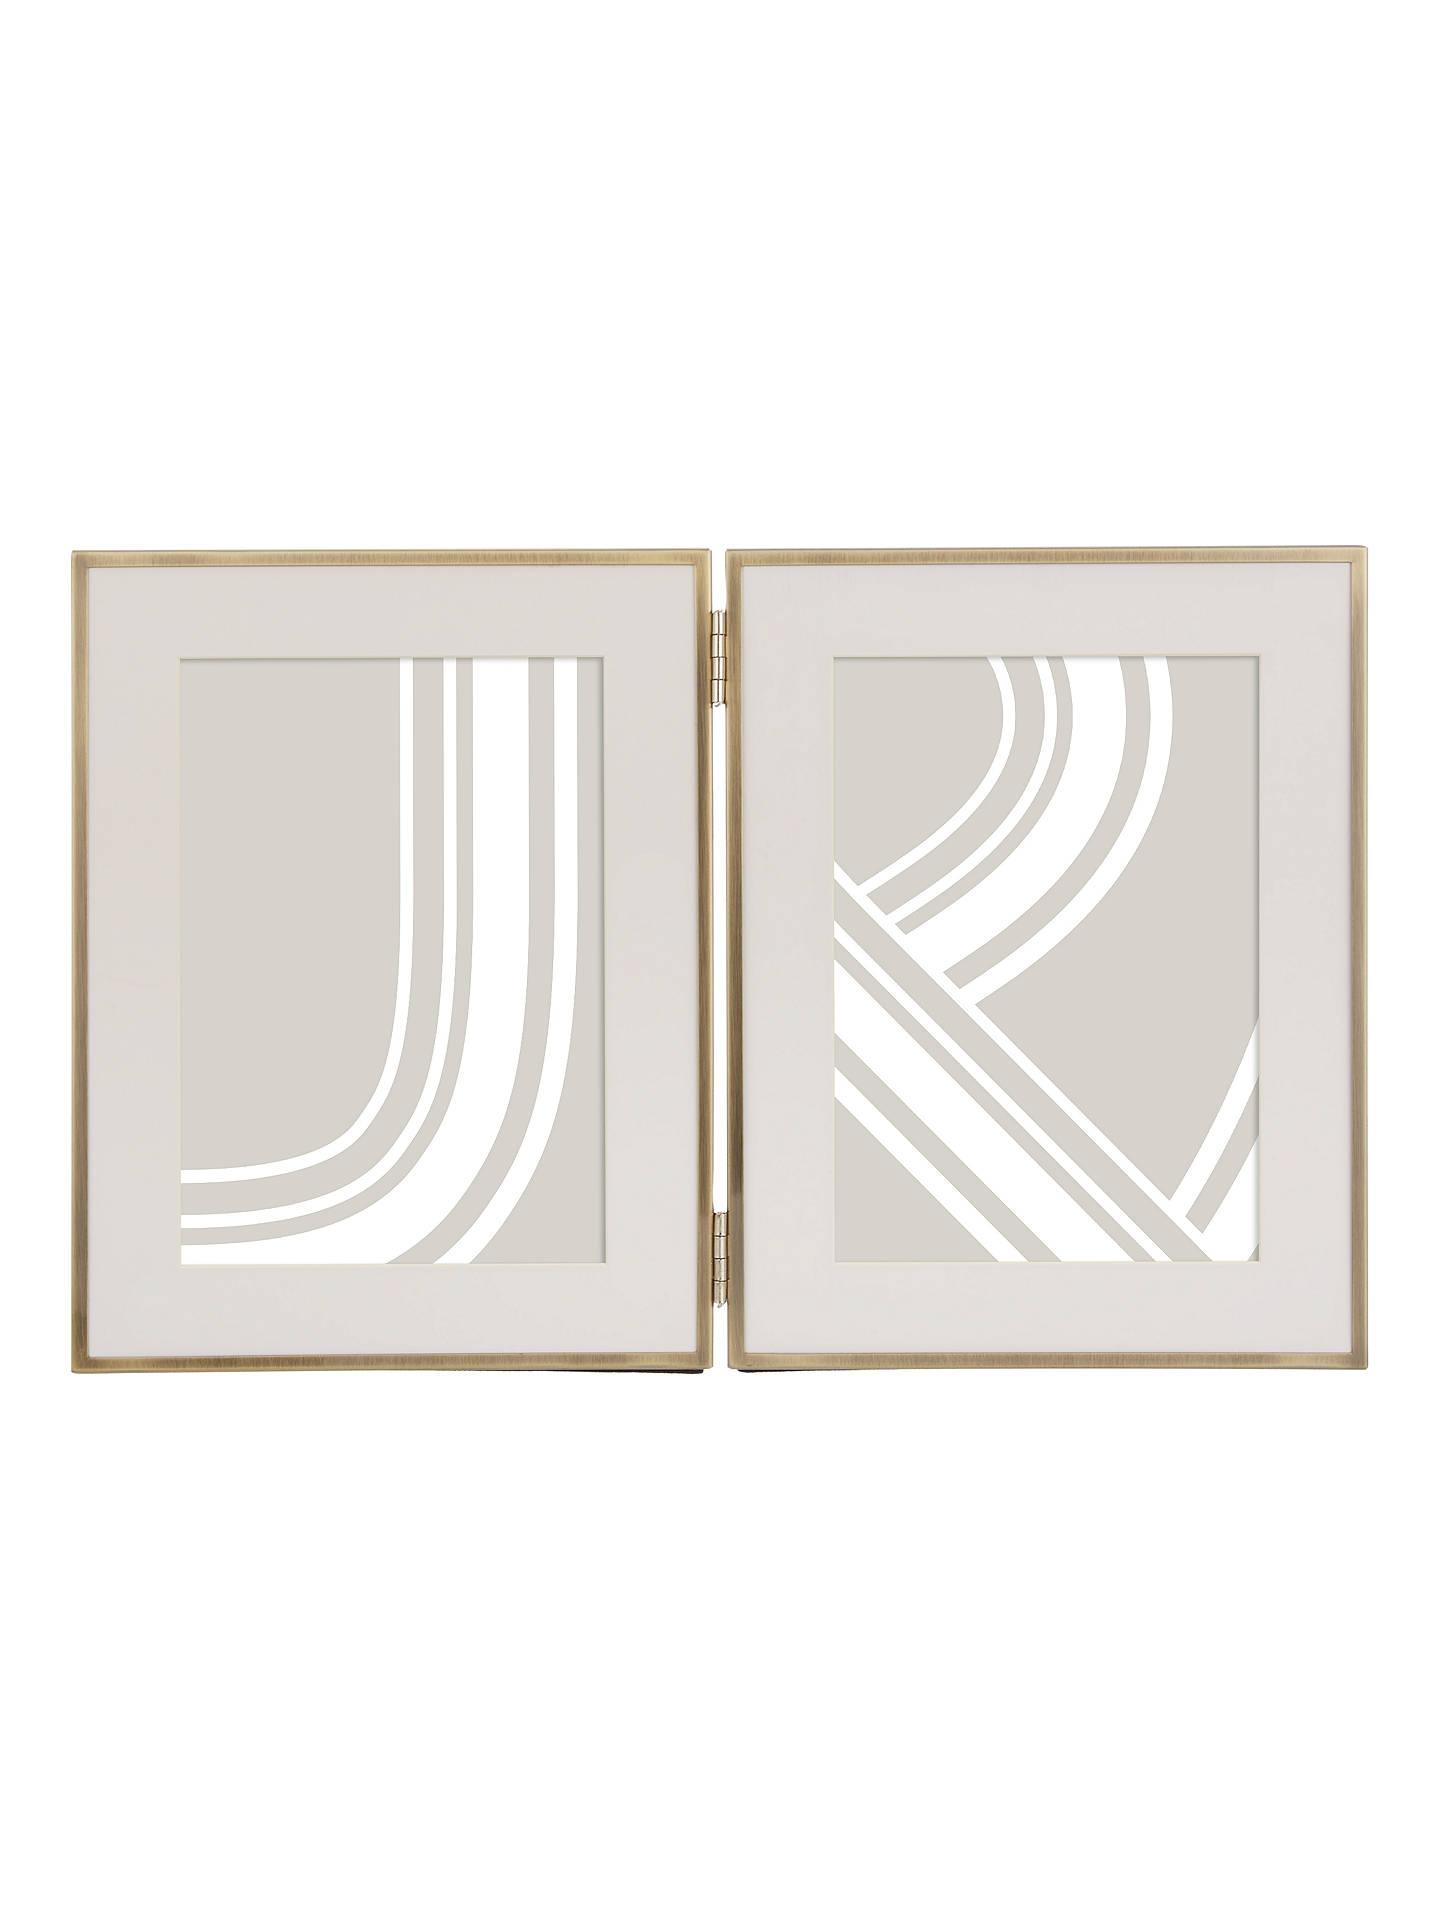 "John Lewis & Partners Daya Double Photo Frame & Mount, 5 X 7"" (13 X 18cm), Brushed Brass by John Lewis & Partners"